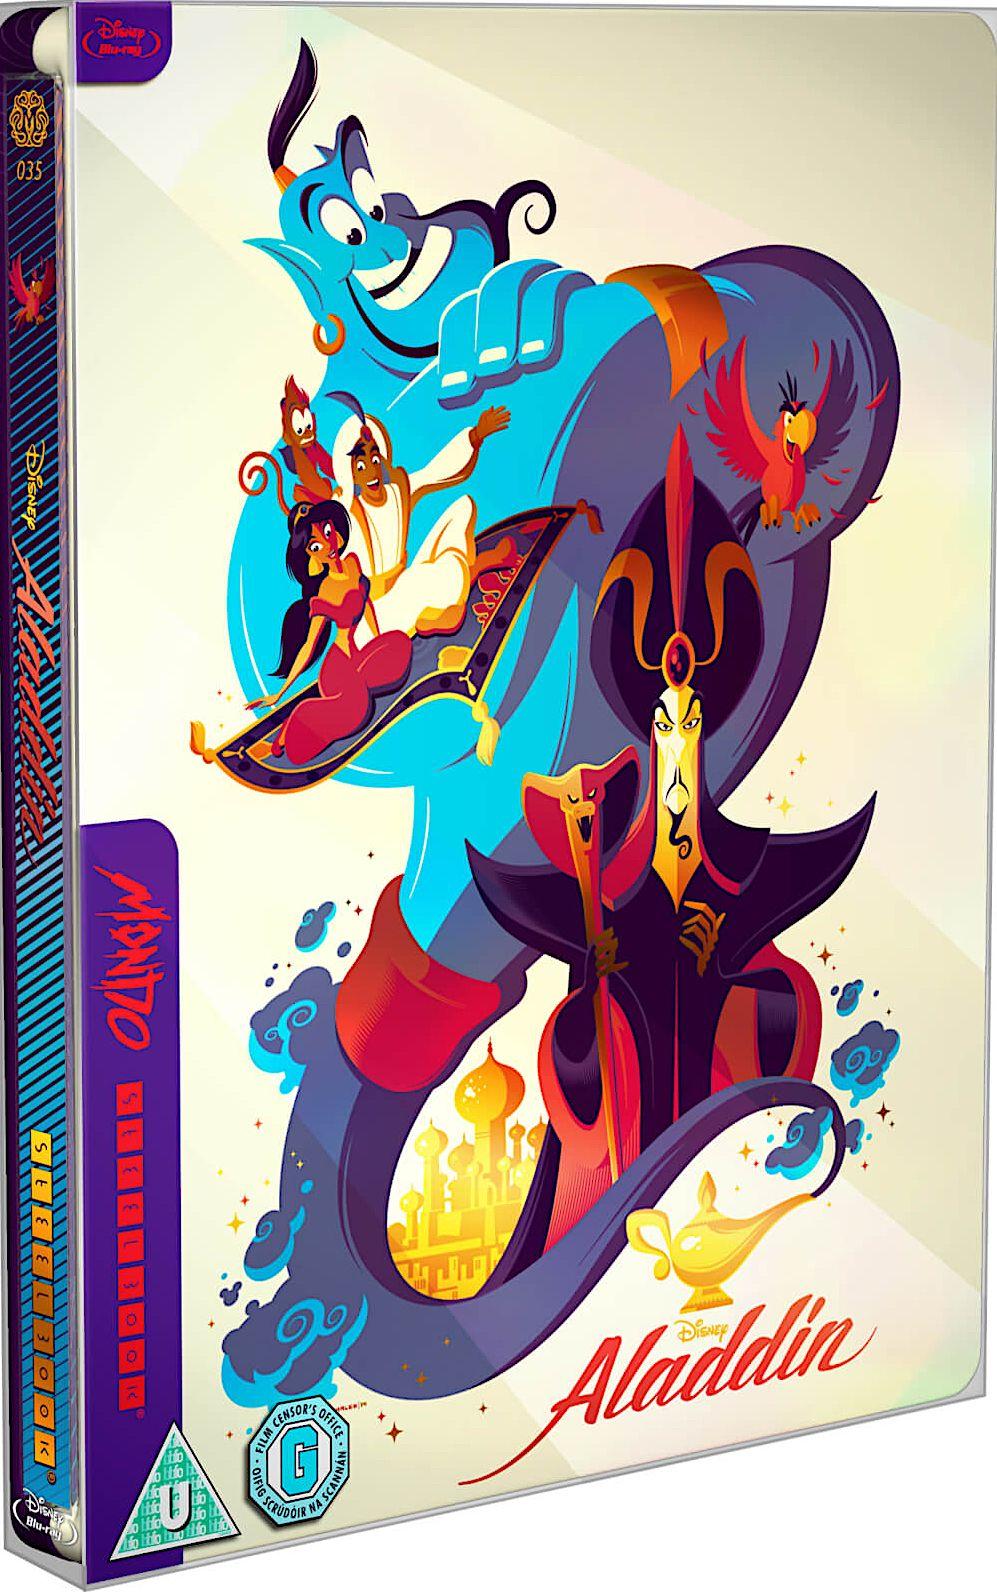 ALADDIN BLURAY STEELBOOK SPINE 35 (MONDO) Aladdin blu